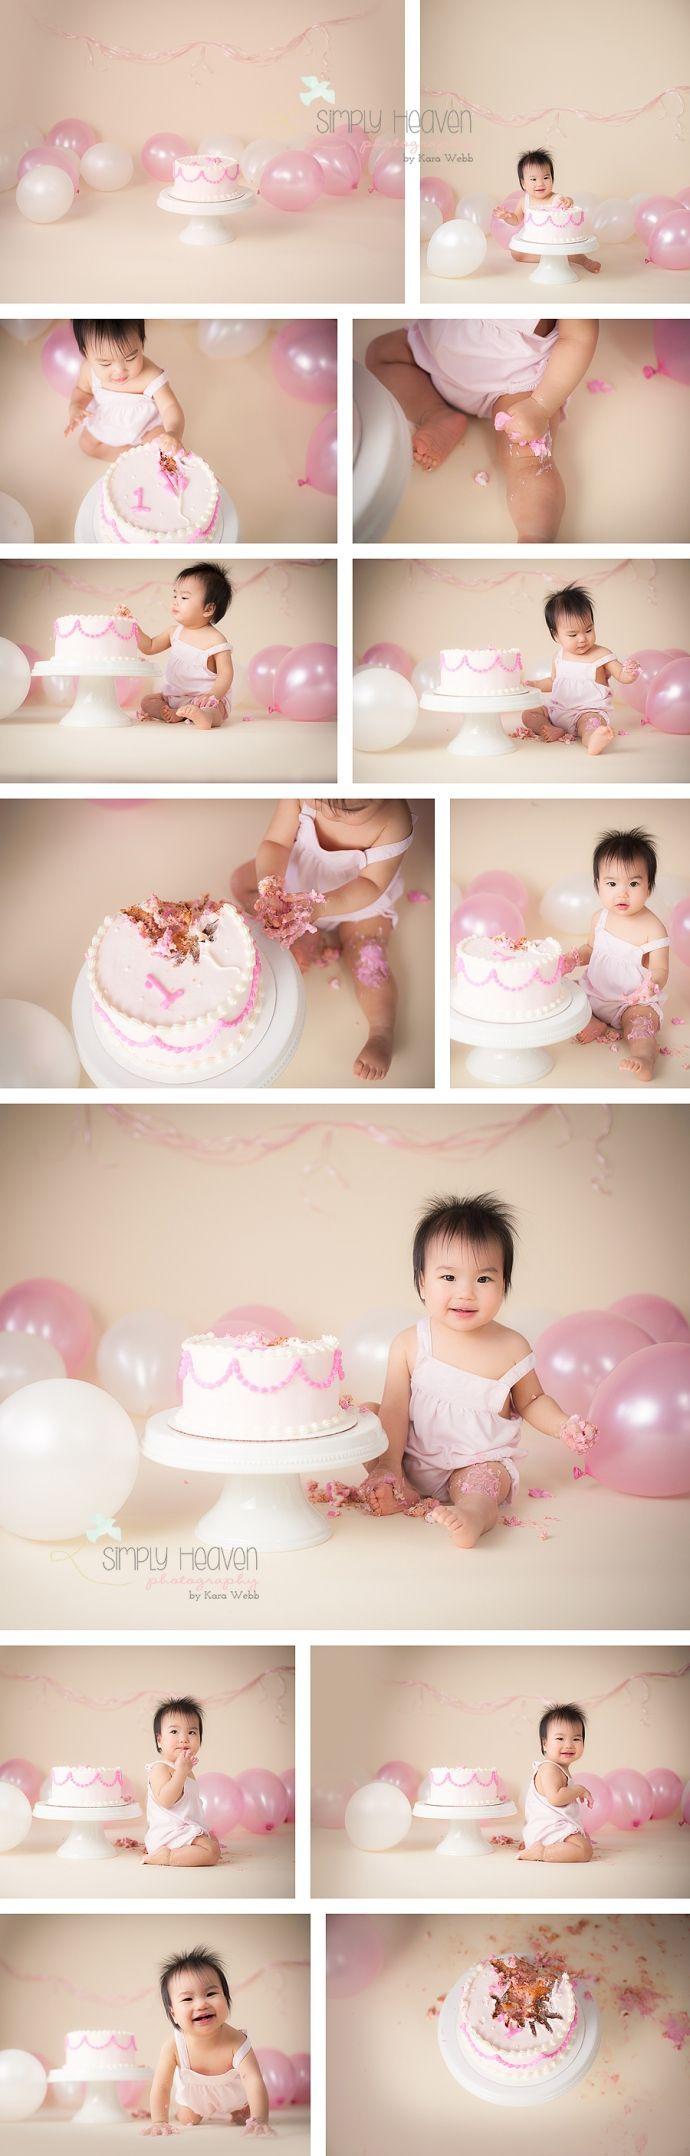 Pink, white, and cream cake smash. Balloons and ribbon!  Simply Heaven Photography | Pinehurst Baby Photographer